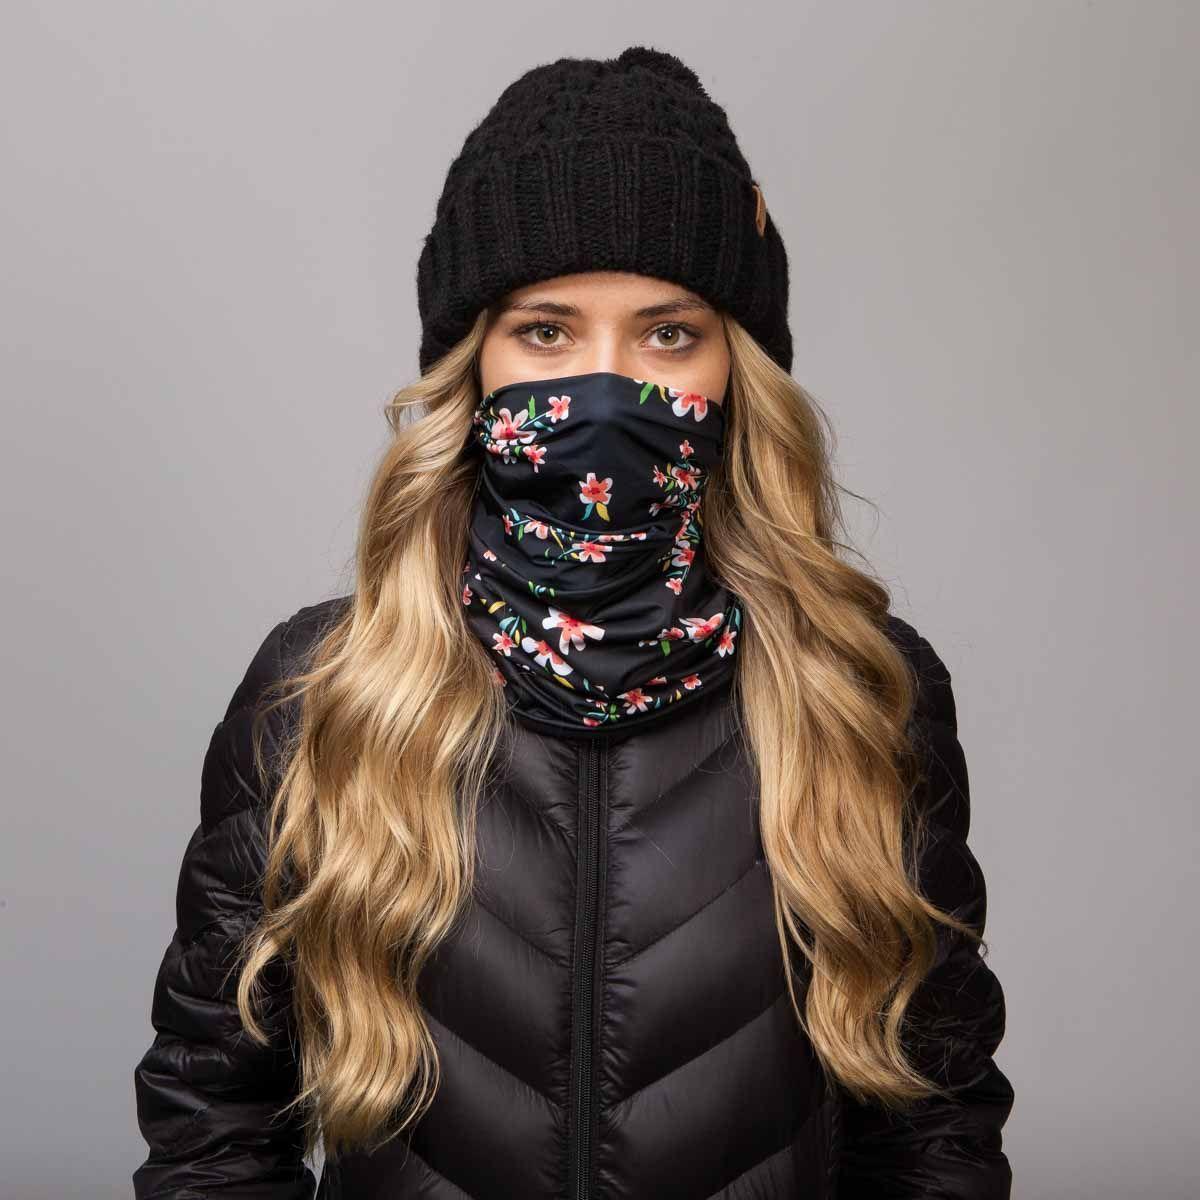 snowboard-ski-face-mask-celtek-womens-hadley-blossom  2273a1f9a6